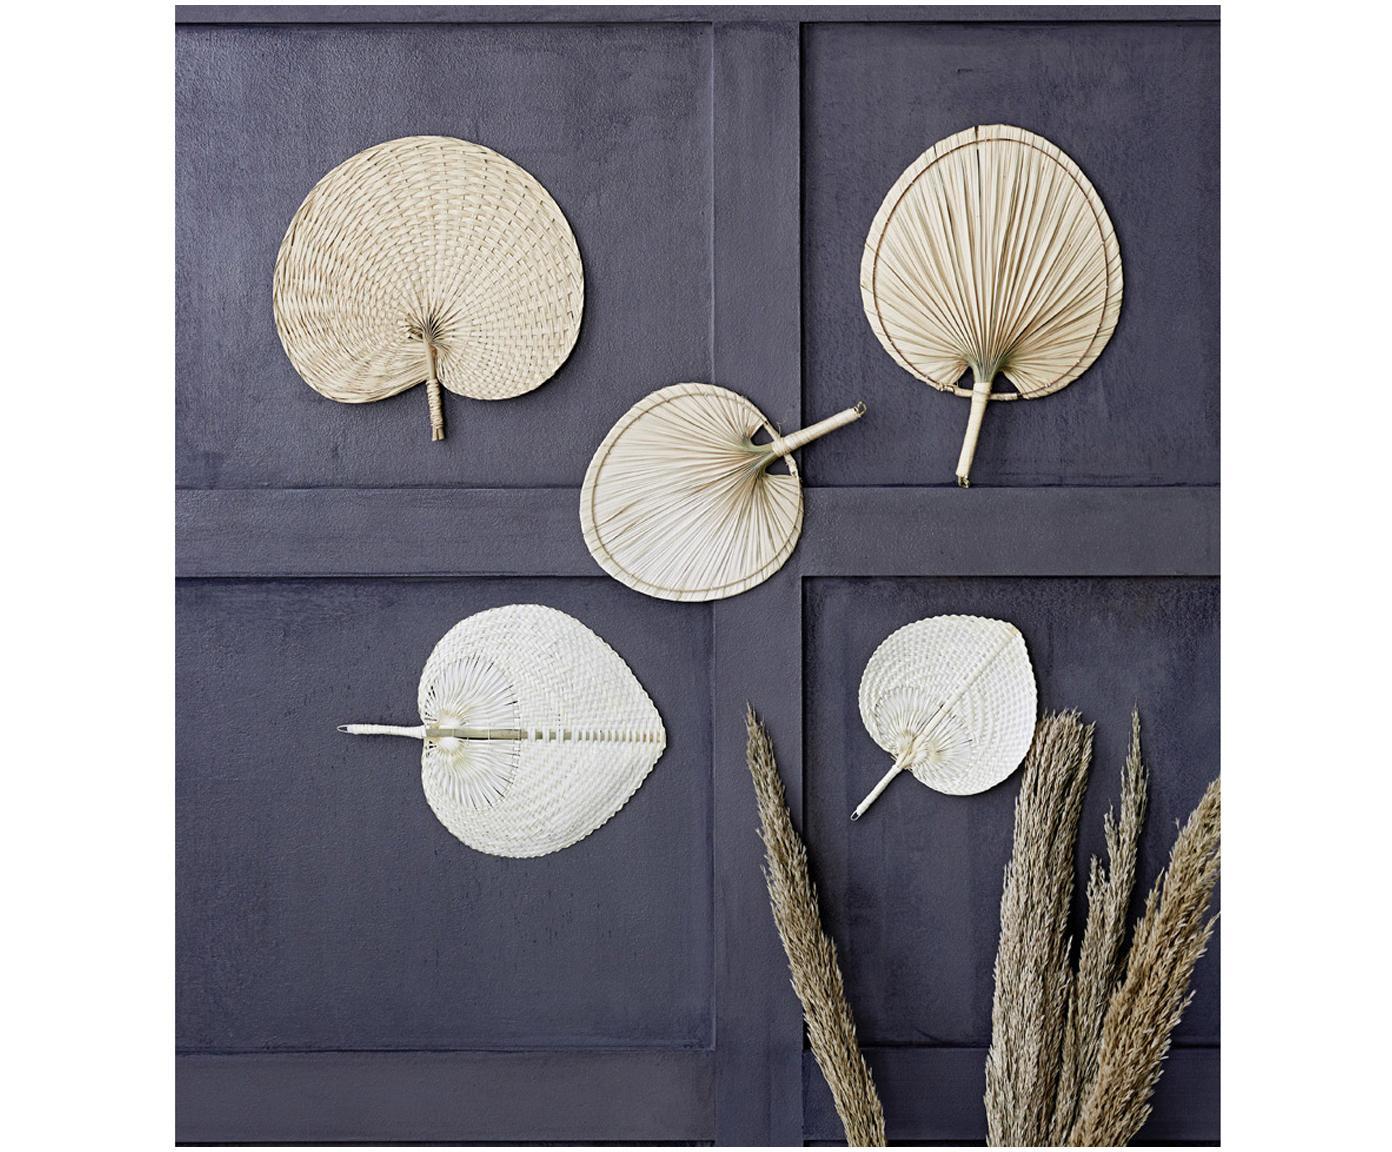 Wandobject Seam van palmvezels, Palmboomvezels, Lichtbruin, 29 x 37 cm